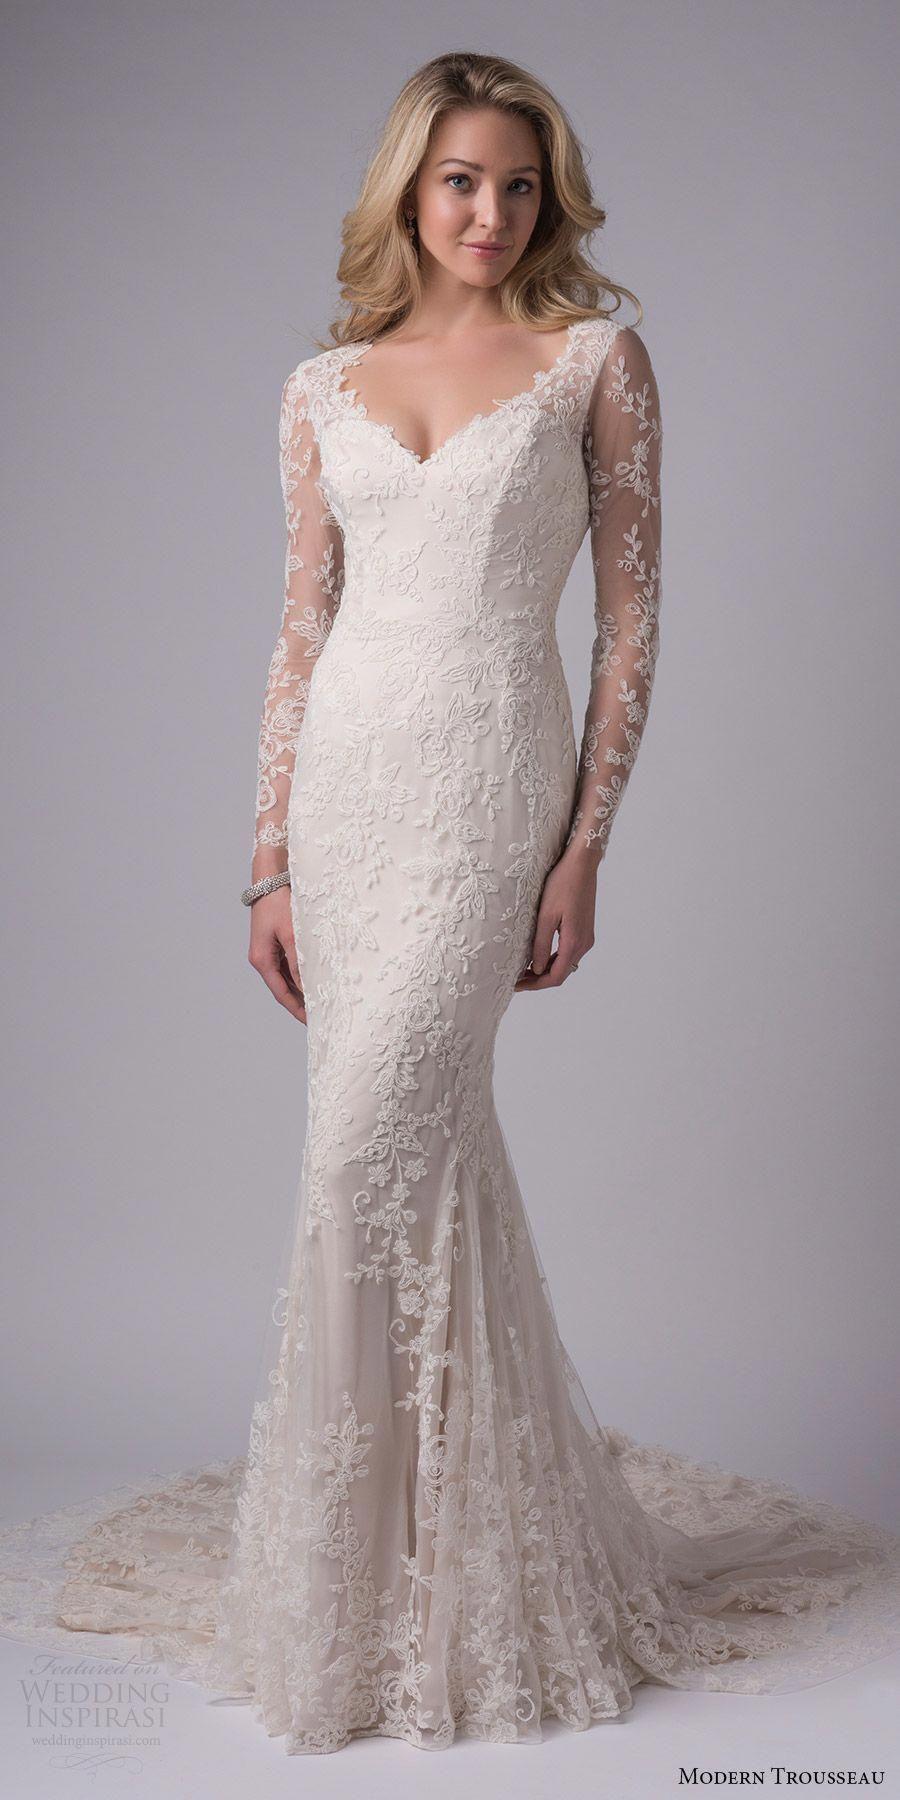 Modern Trousseau Bridal Fall 2017 Illusion Long Sleeves Lace Sheath